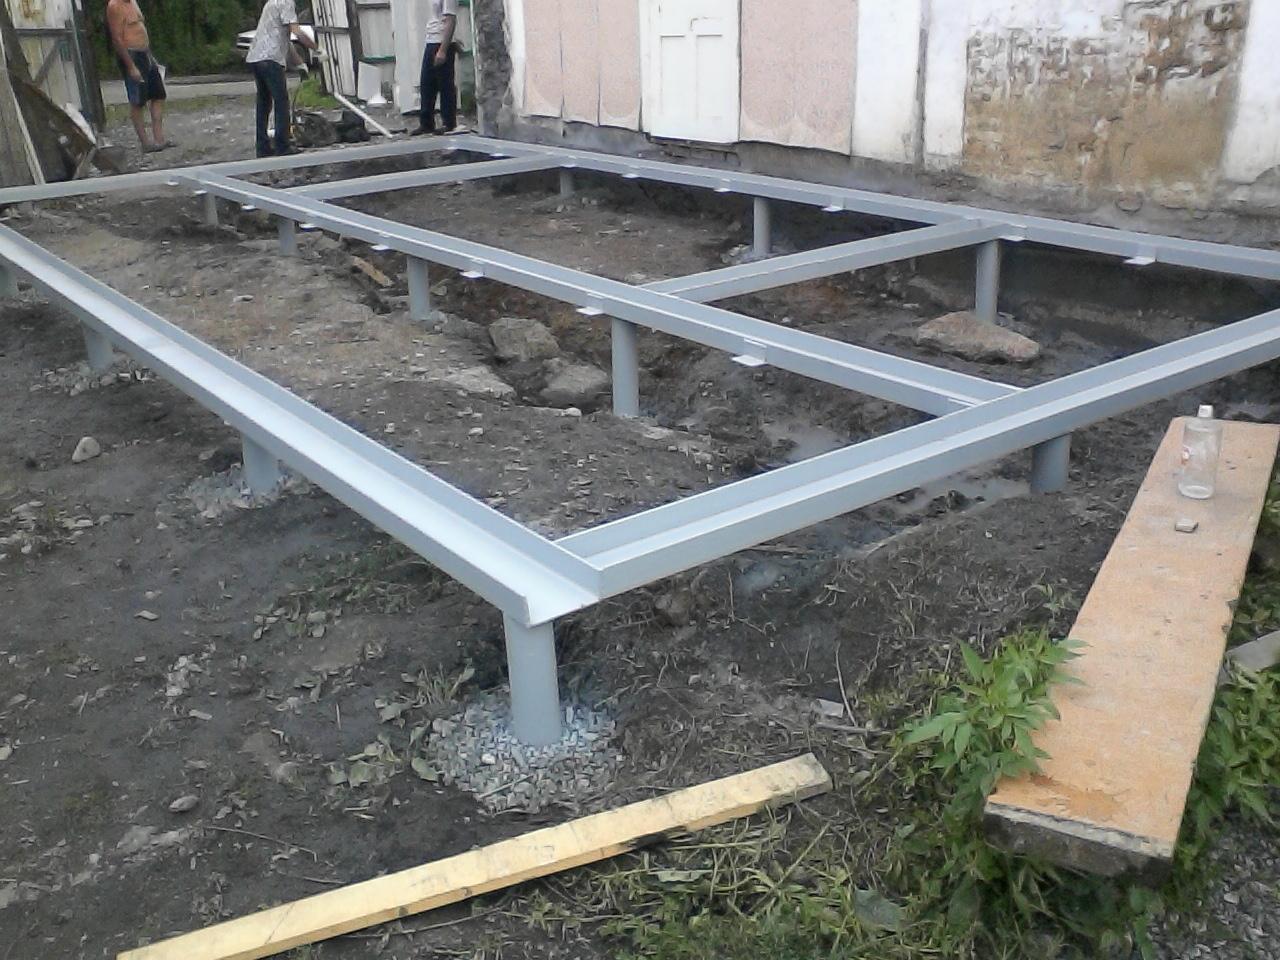 Возводим фундамент для пристройки к дому. Технология строительства ленточного фундамента. Ленточный фундамент для пристройки к д